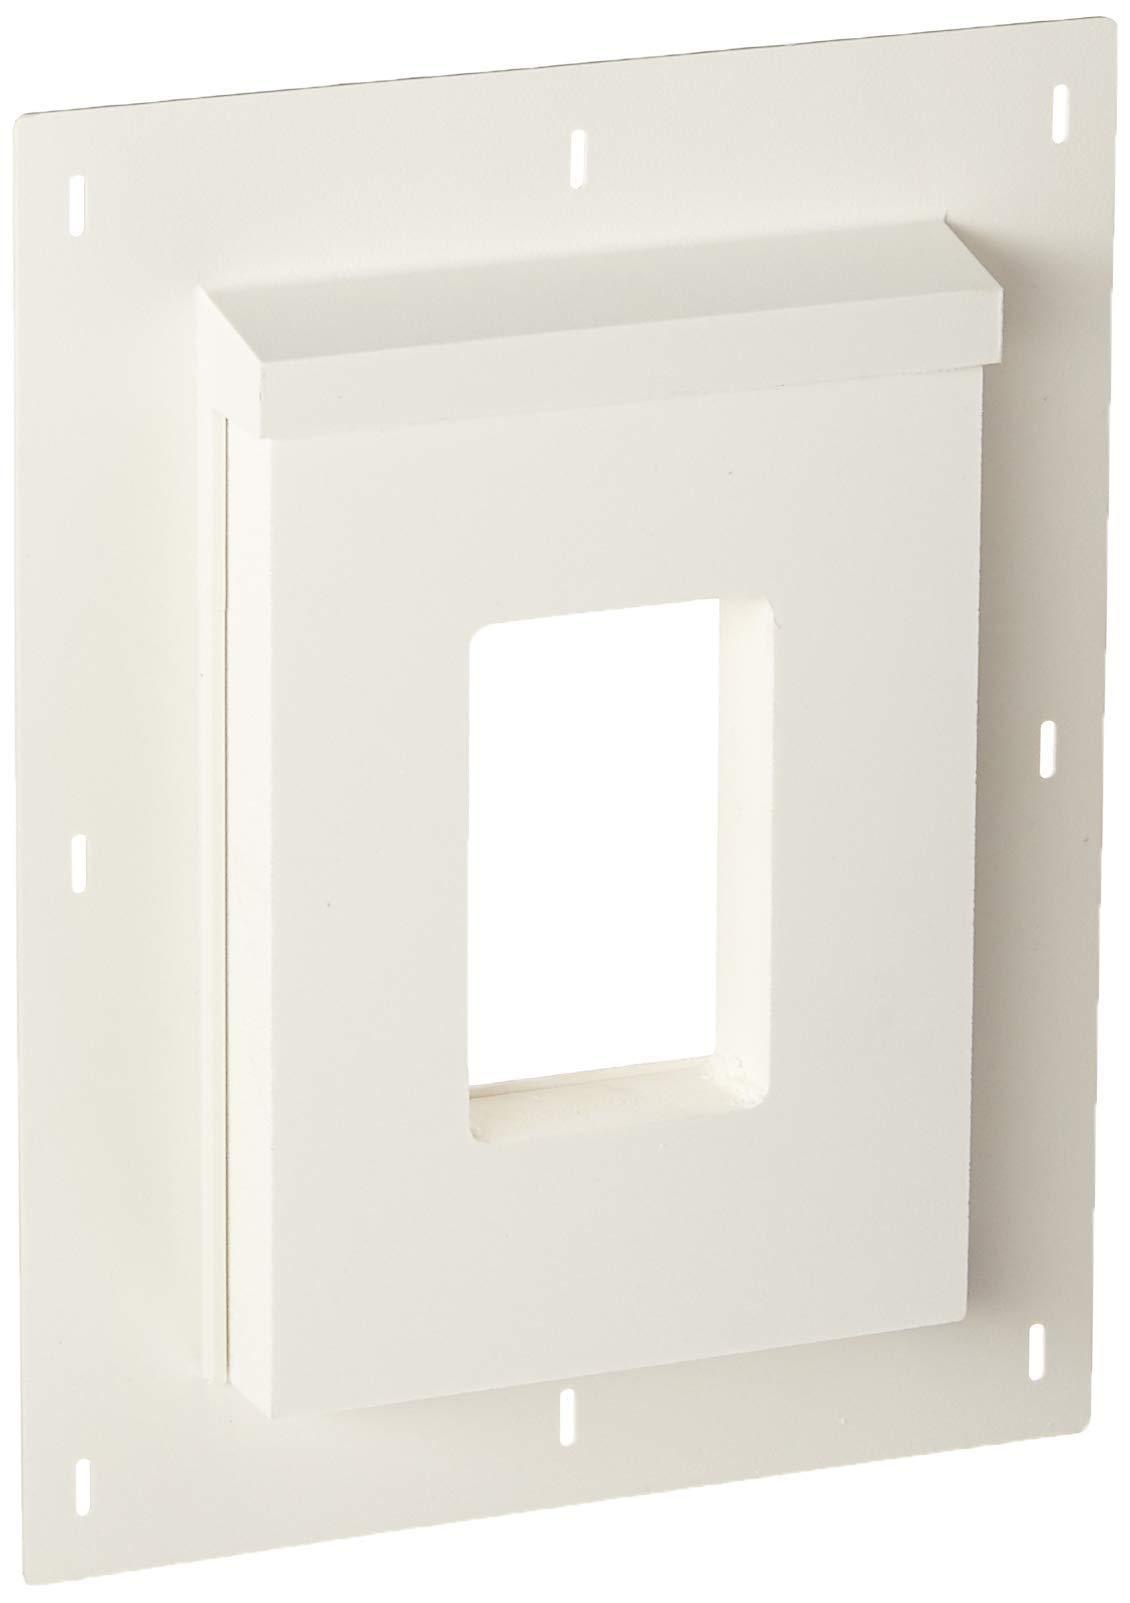 Builders Edge SMR68TW Sturdimount Receptacle Primed Mounting Block, 6 In W X 8-1/2 In H, Fiber Cement (Renewed)